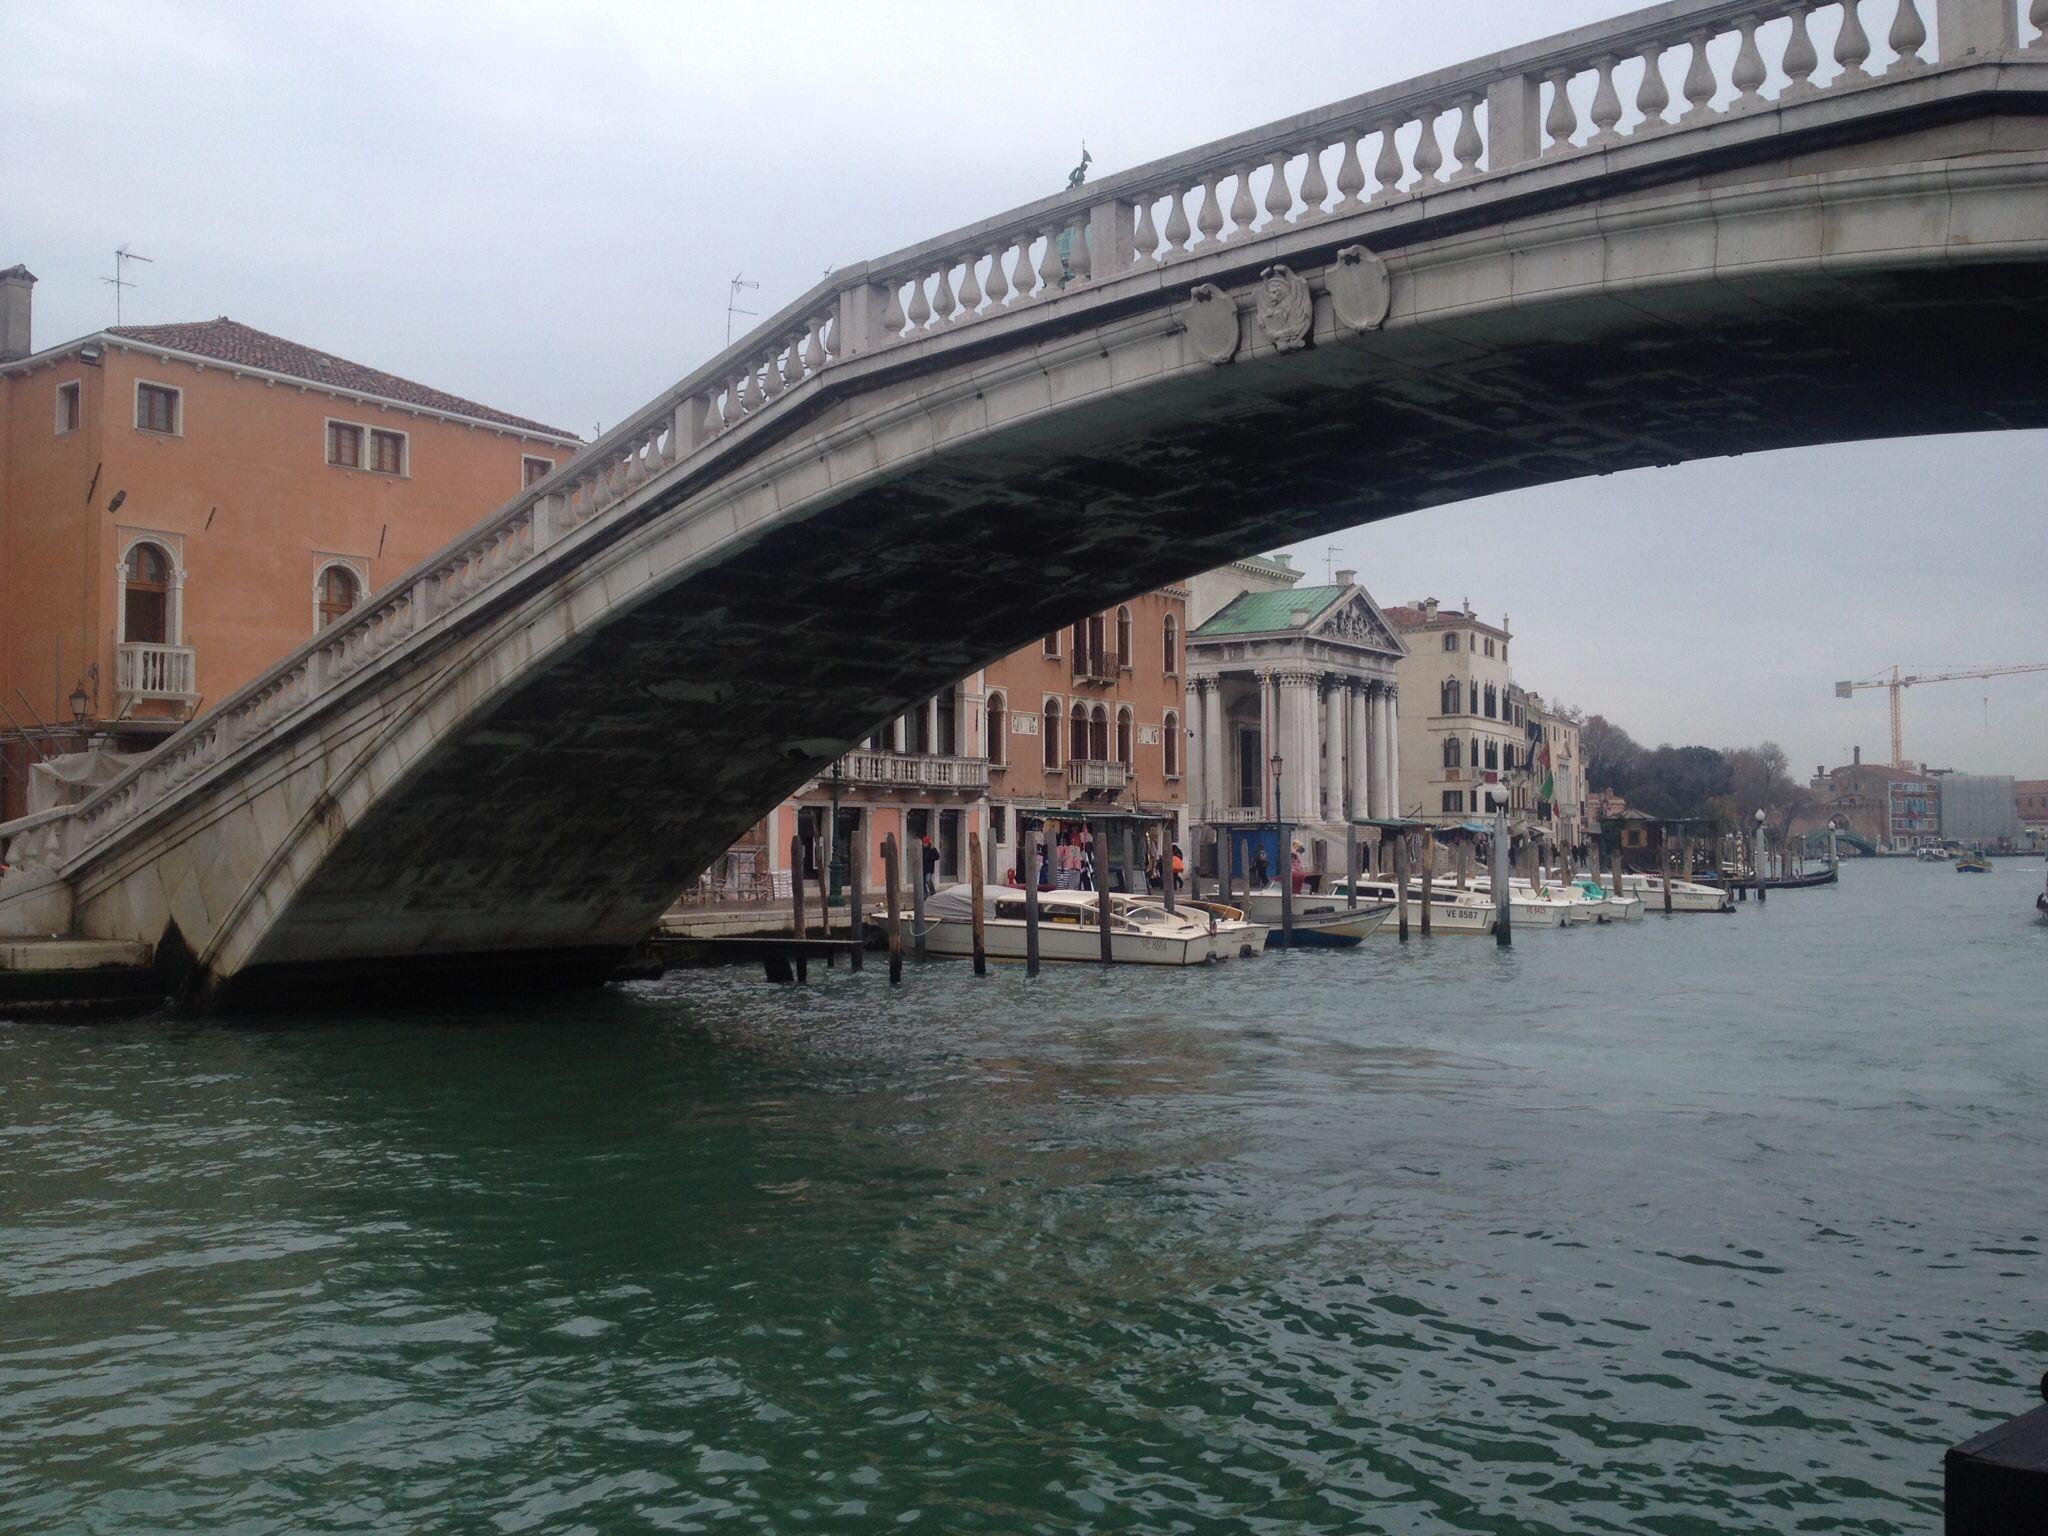 One of Venice's many bridges